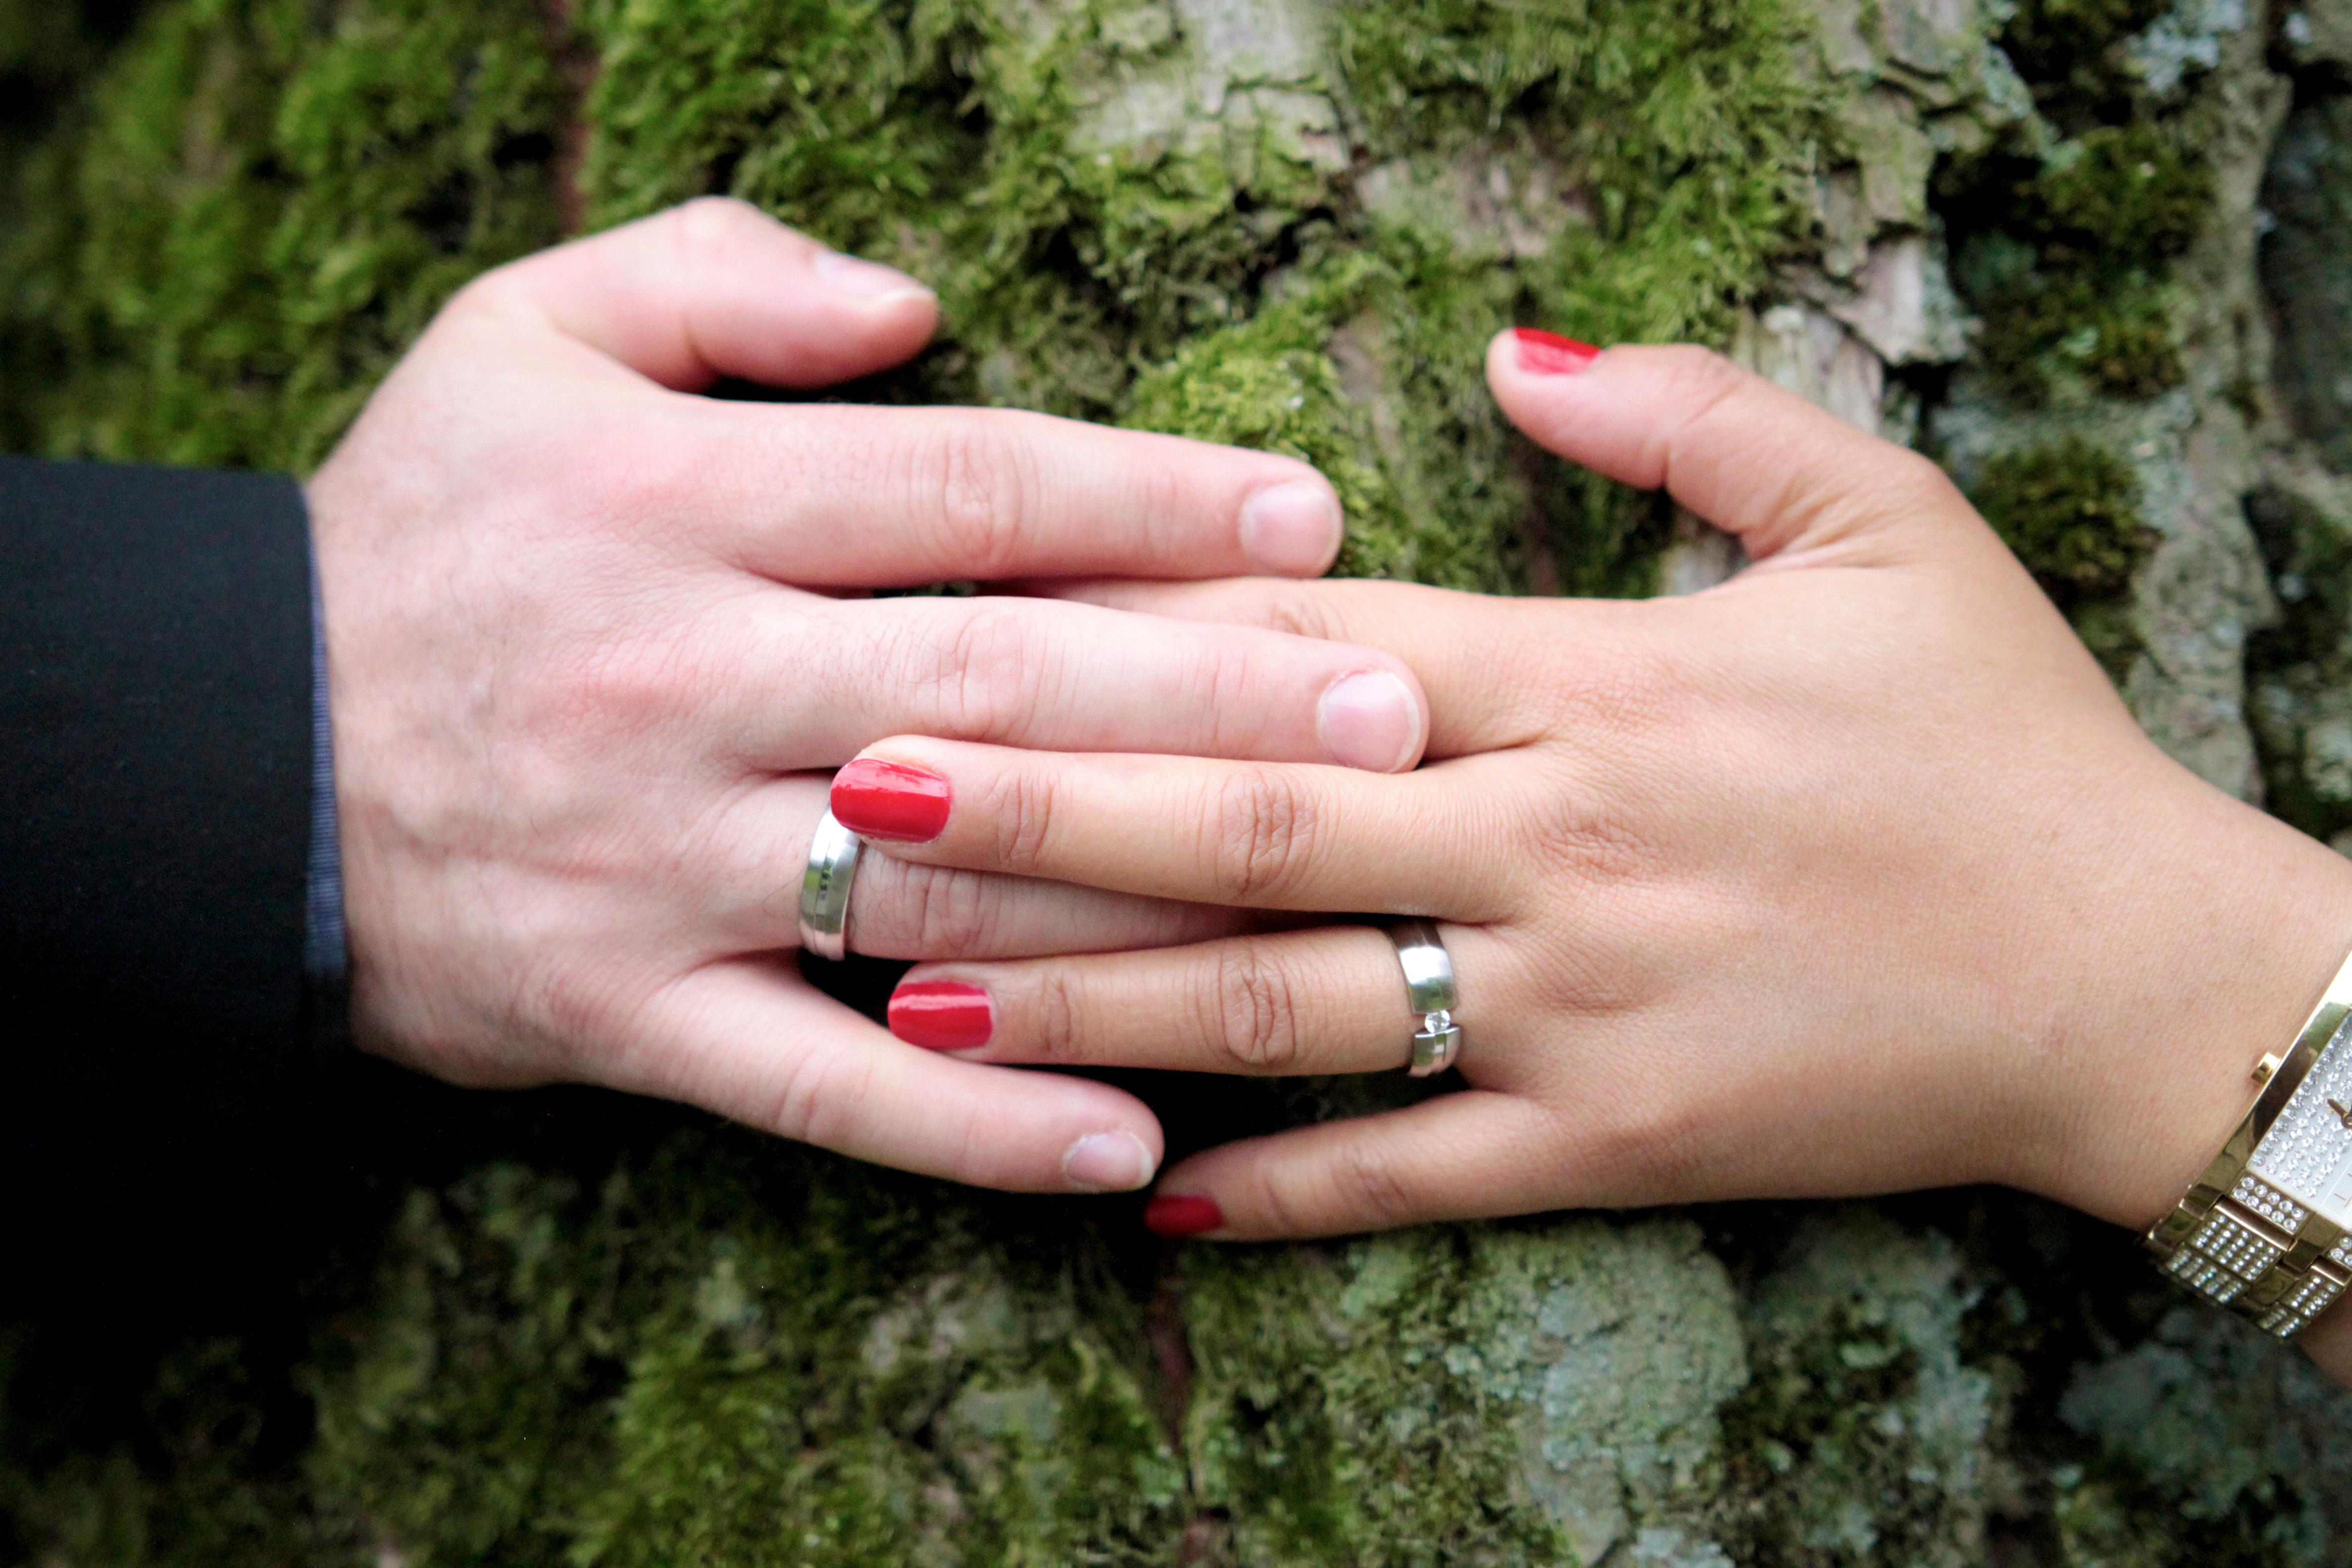 Fotos gratis : mano, hombre, árbol, naturaleza, mujer, pierna, amor ...